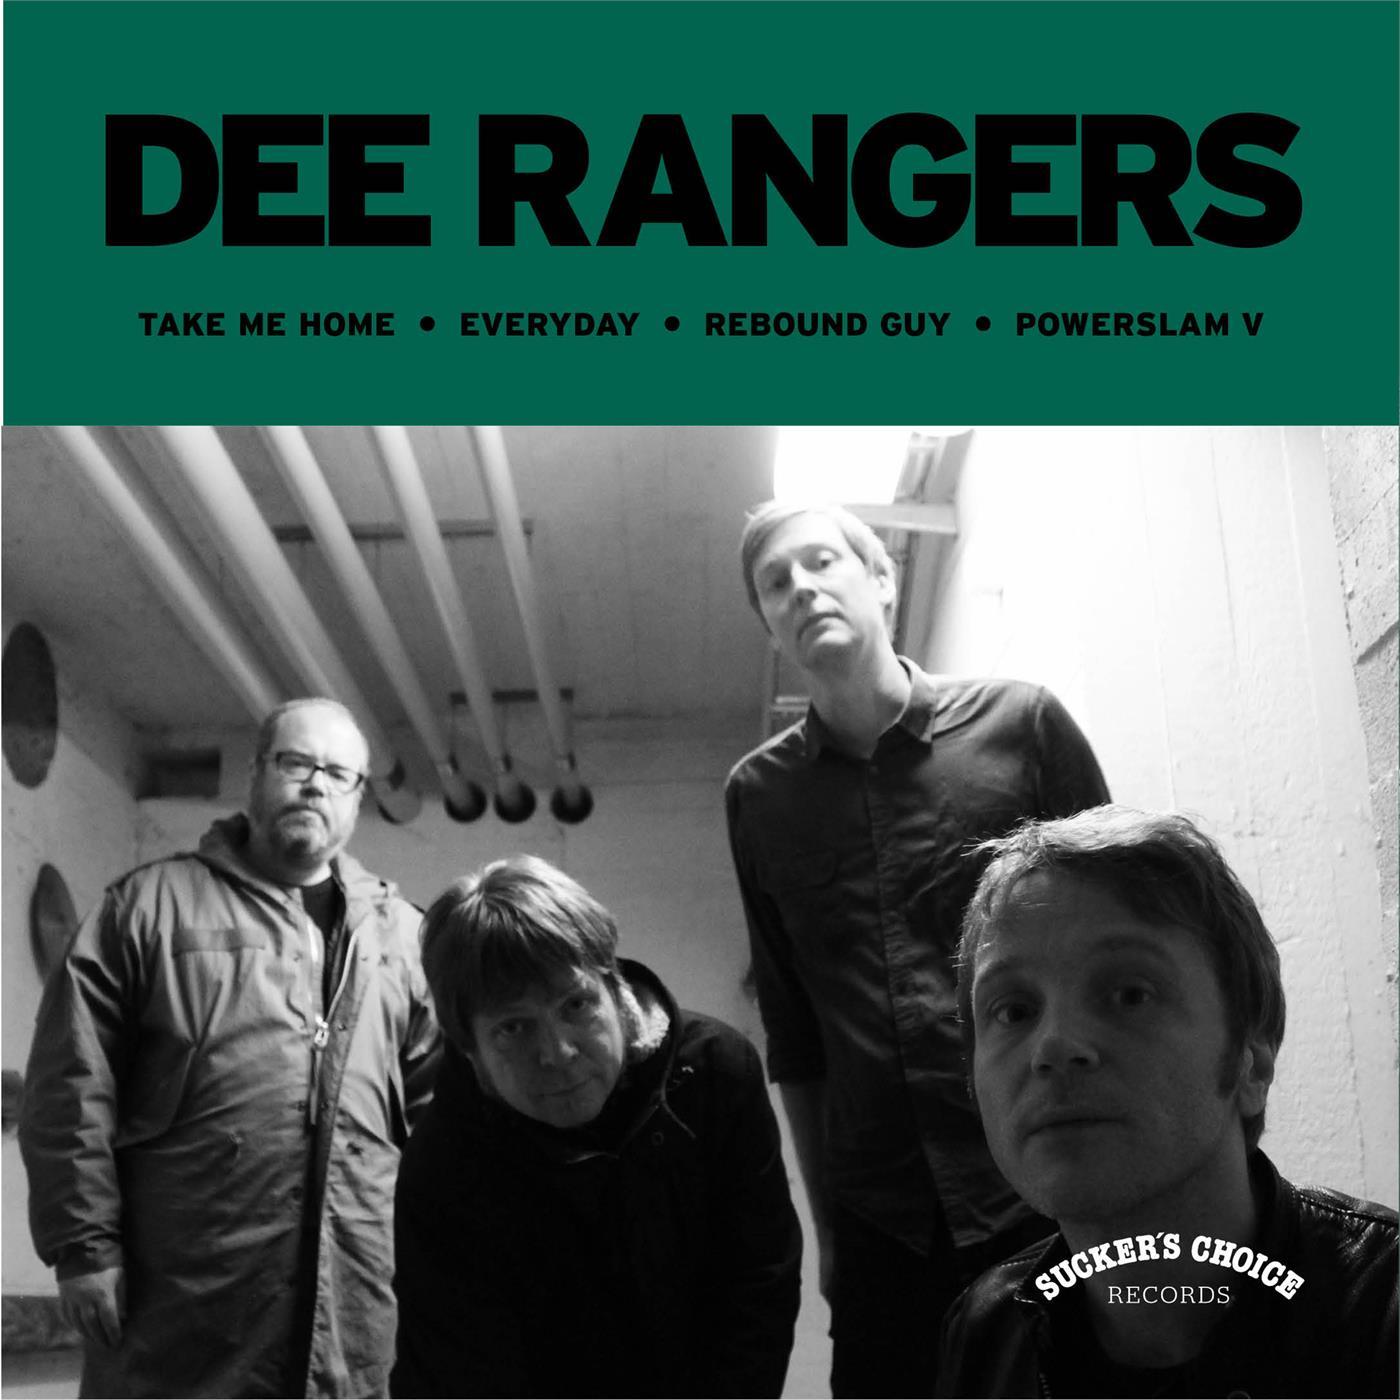 Dee Rangers Blue Swedes